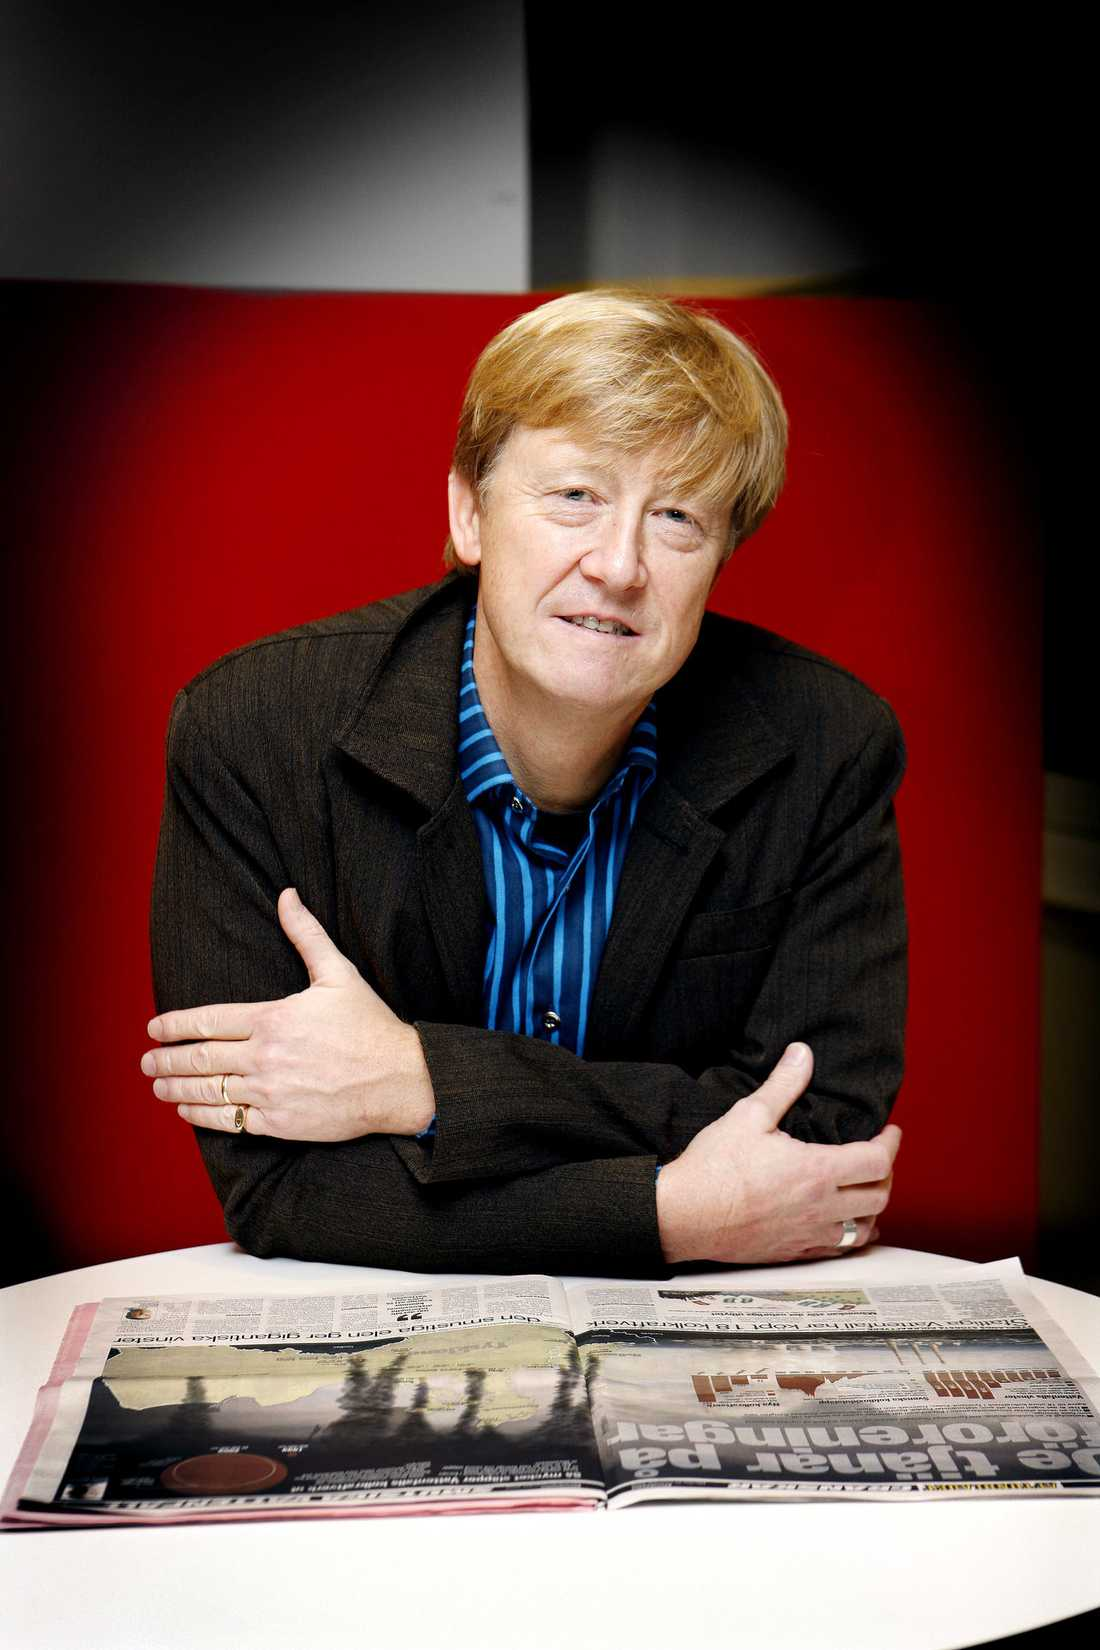 Andreas Carlgren, (c) Miljöminister.